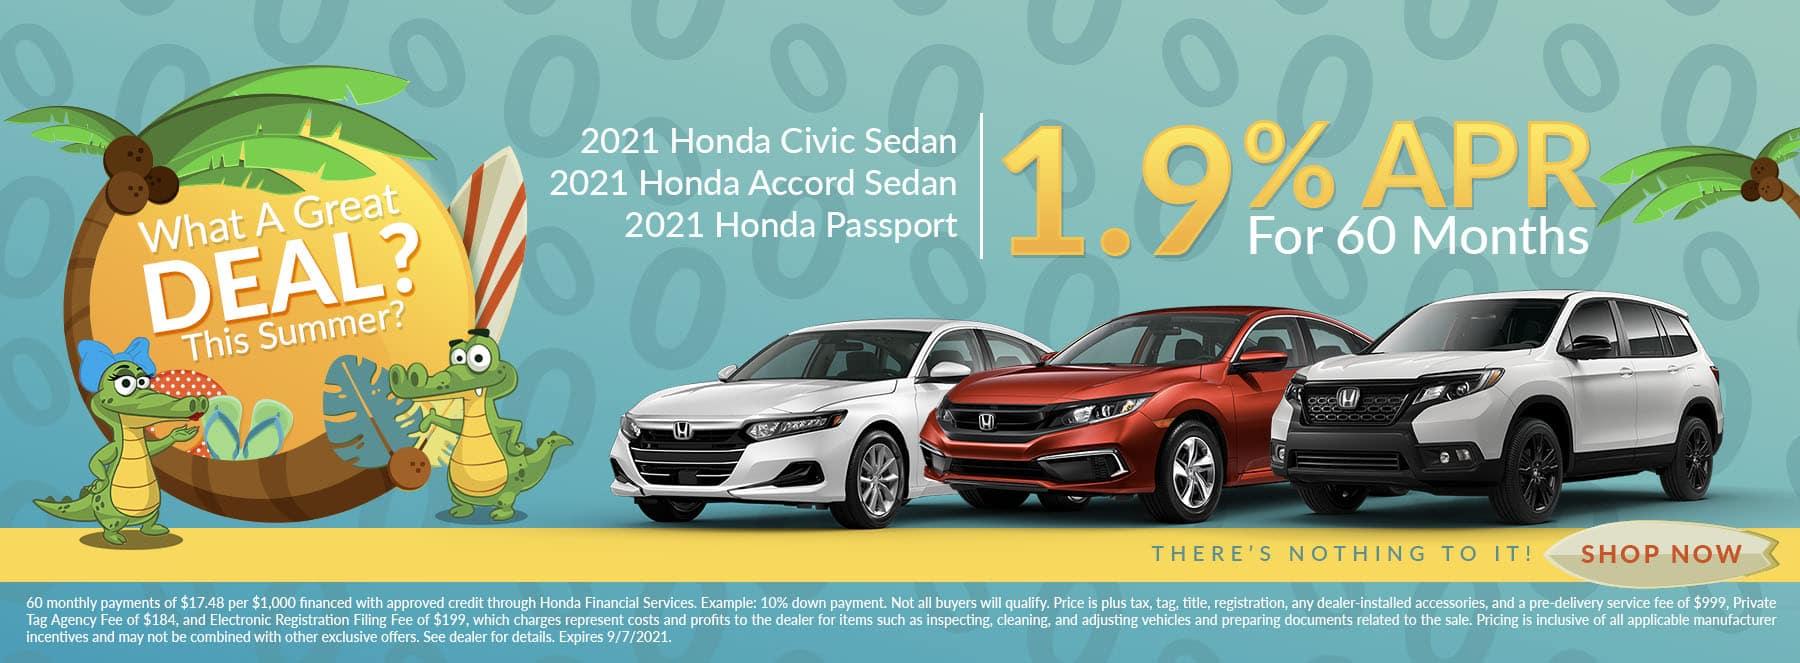 Want A Great Deal This Summer? | 2021 Honda Civic Sedan, 2021 Honda Accord Sedan, 2021 Honda Passport | 1.9% APR For 60 Months